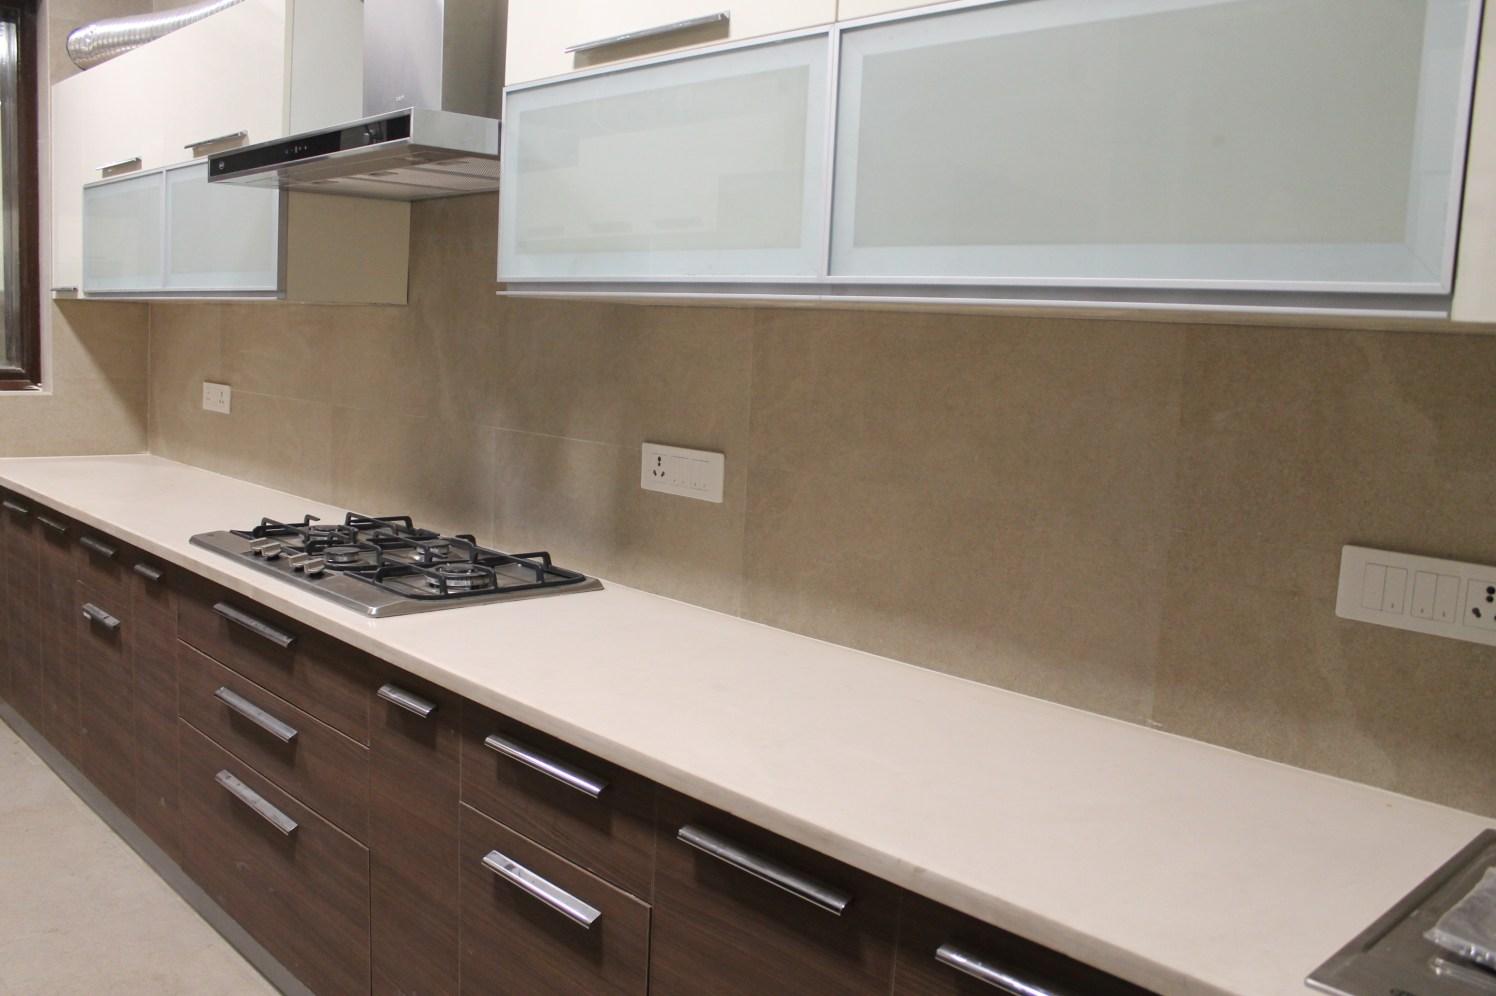 Modern modular U shaped kitchen by coalitiondesigns Modular-kitchen Modern | Interior Design Photos & Ideas